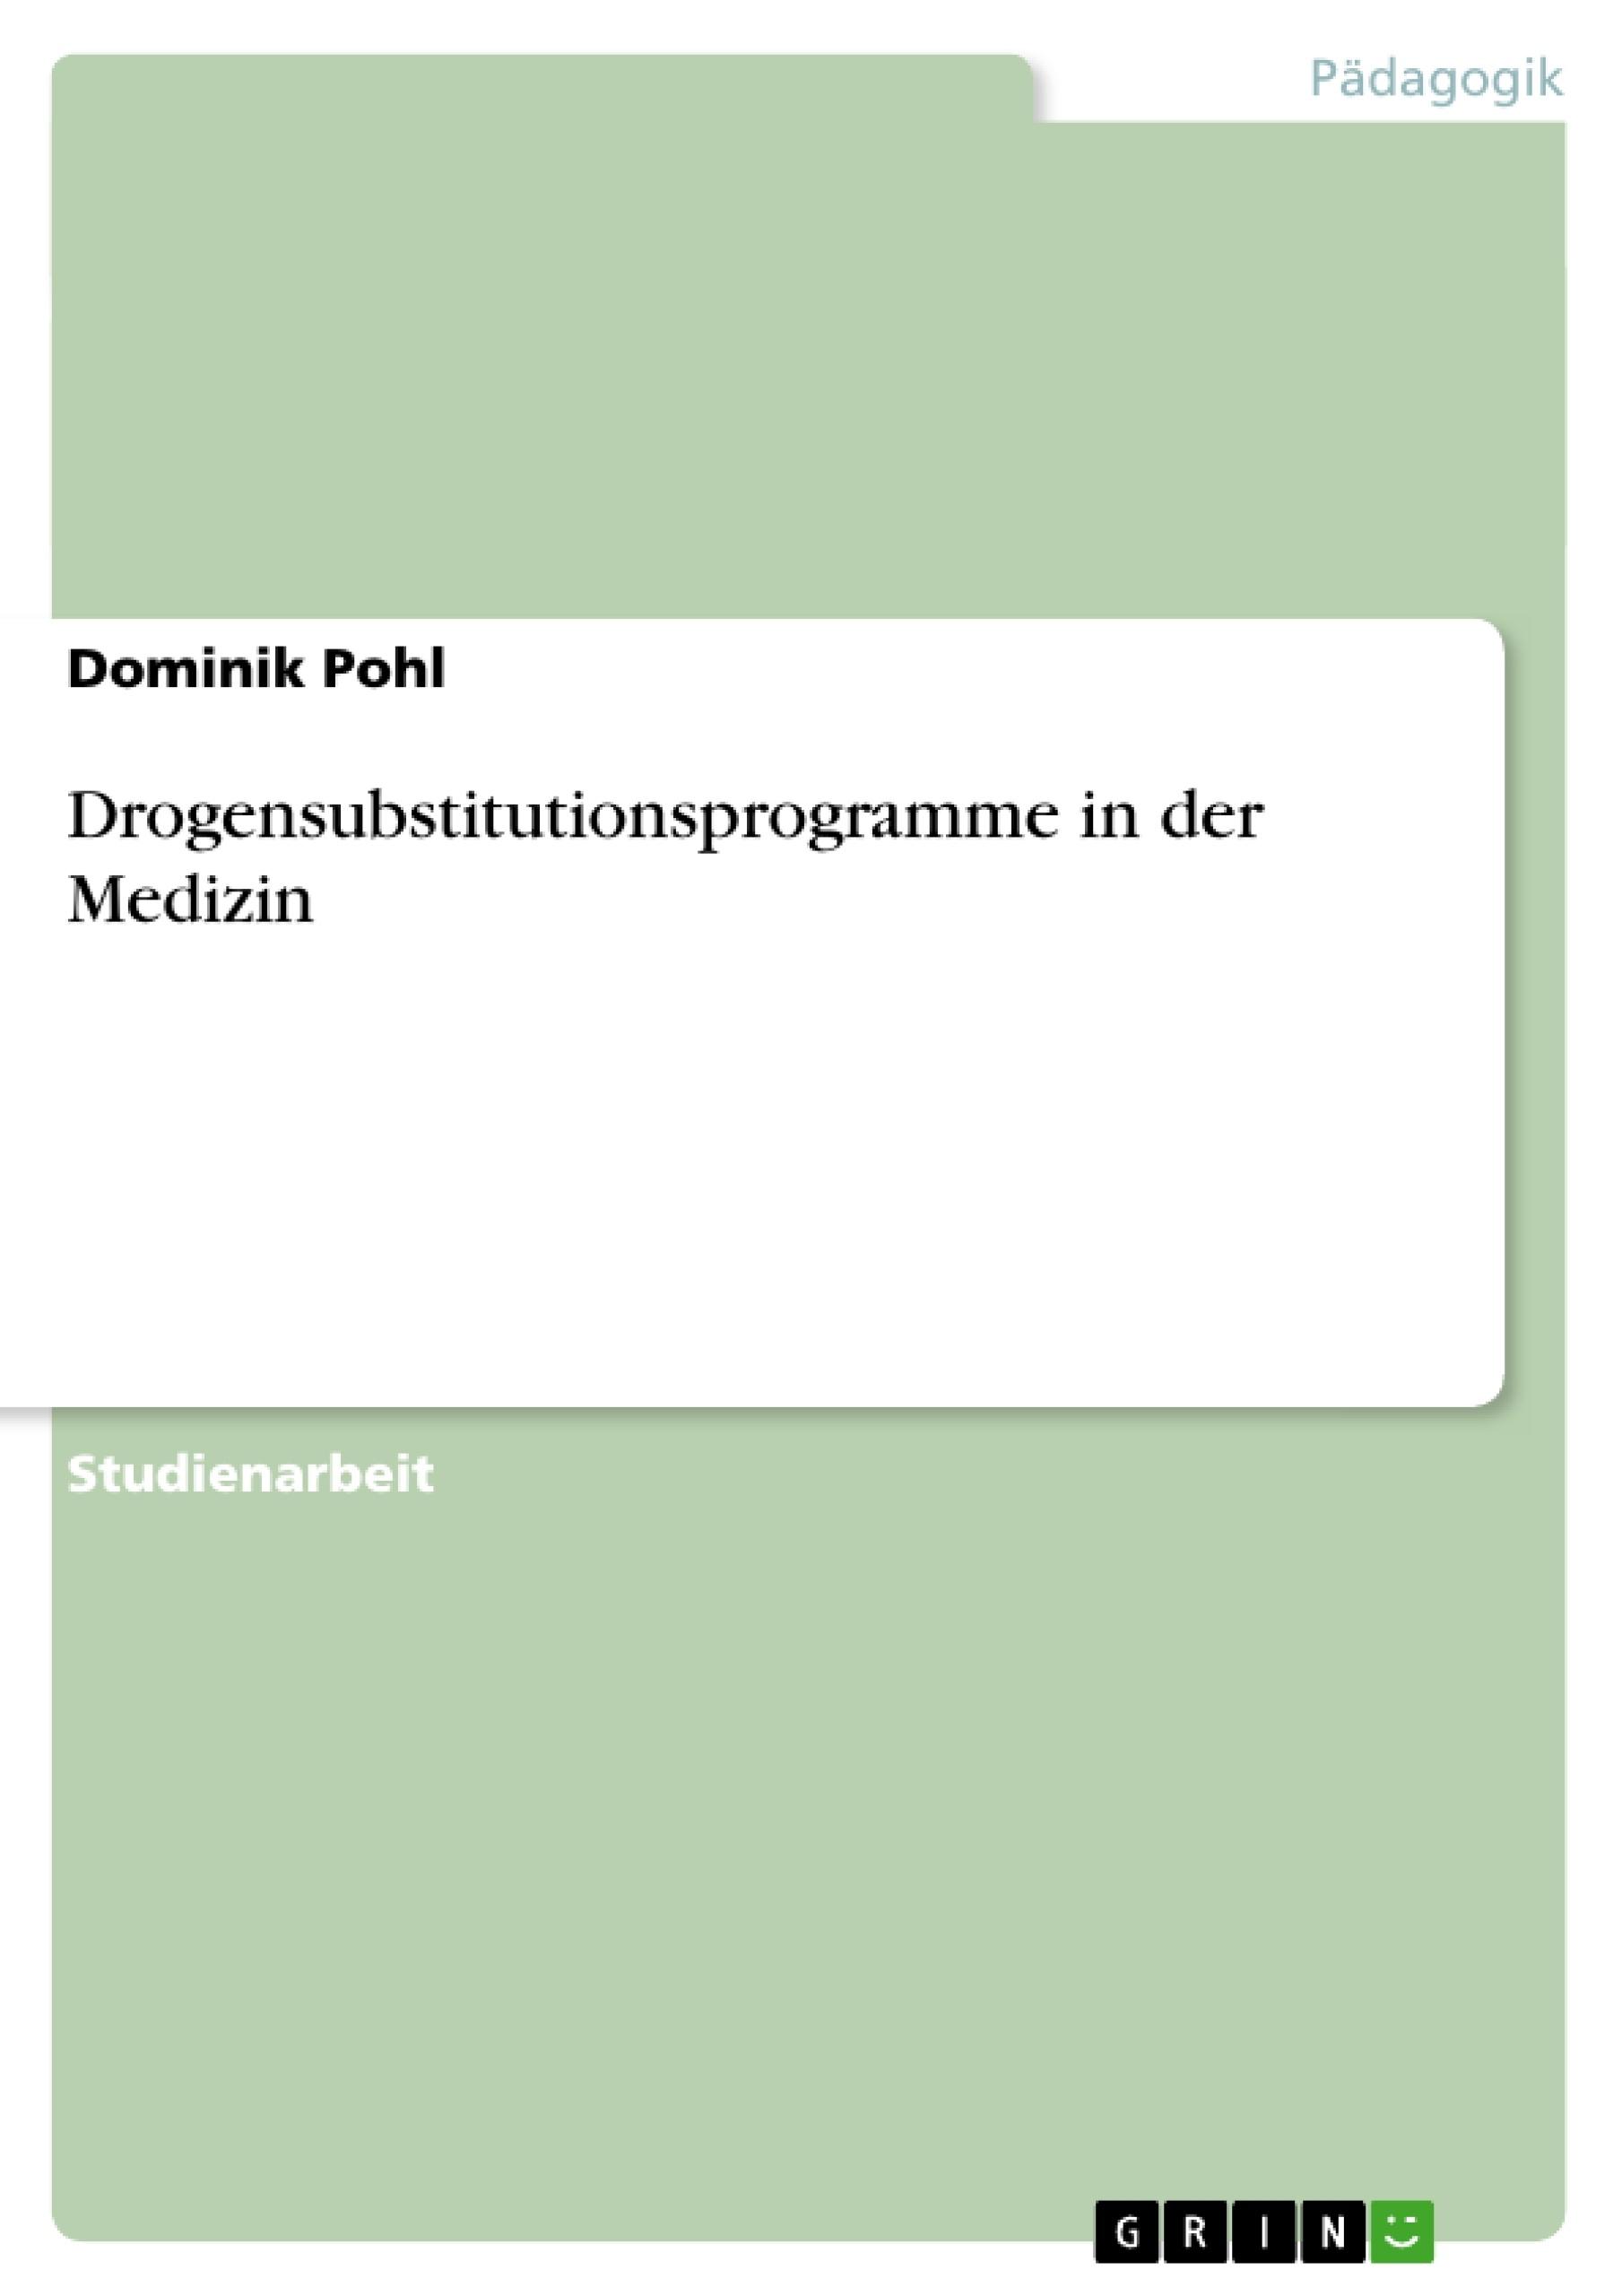 Titel: Drogensubstitutionsprogramme in der Medizin